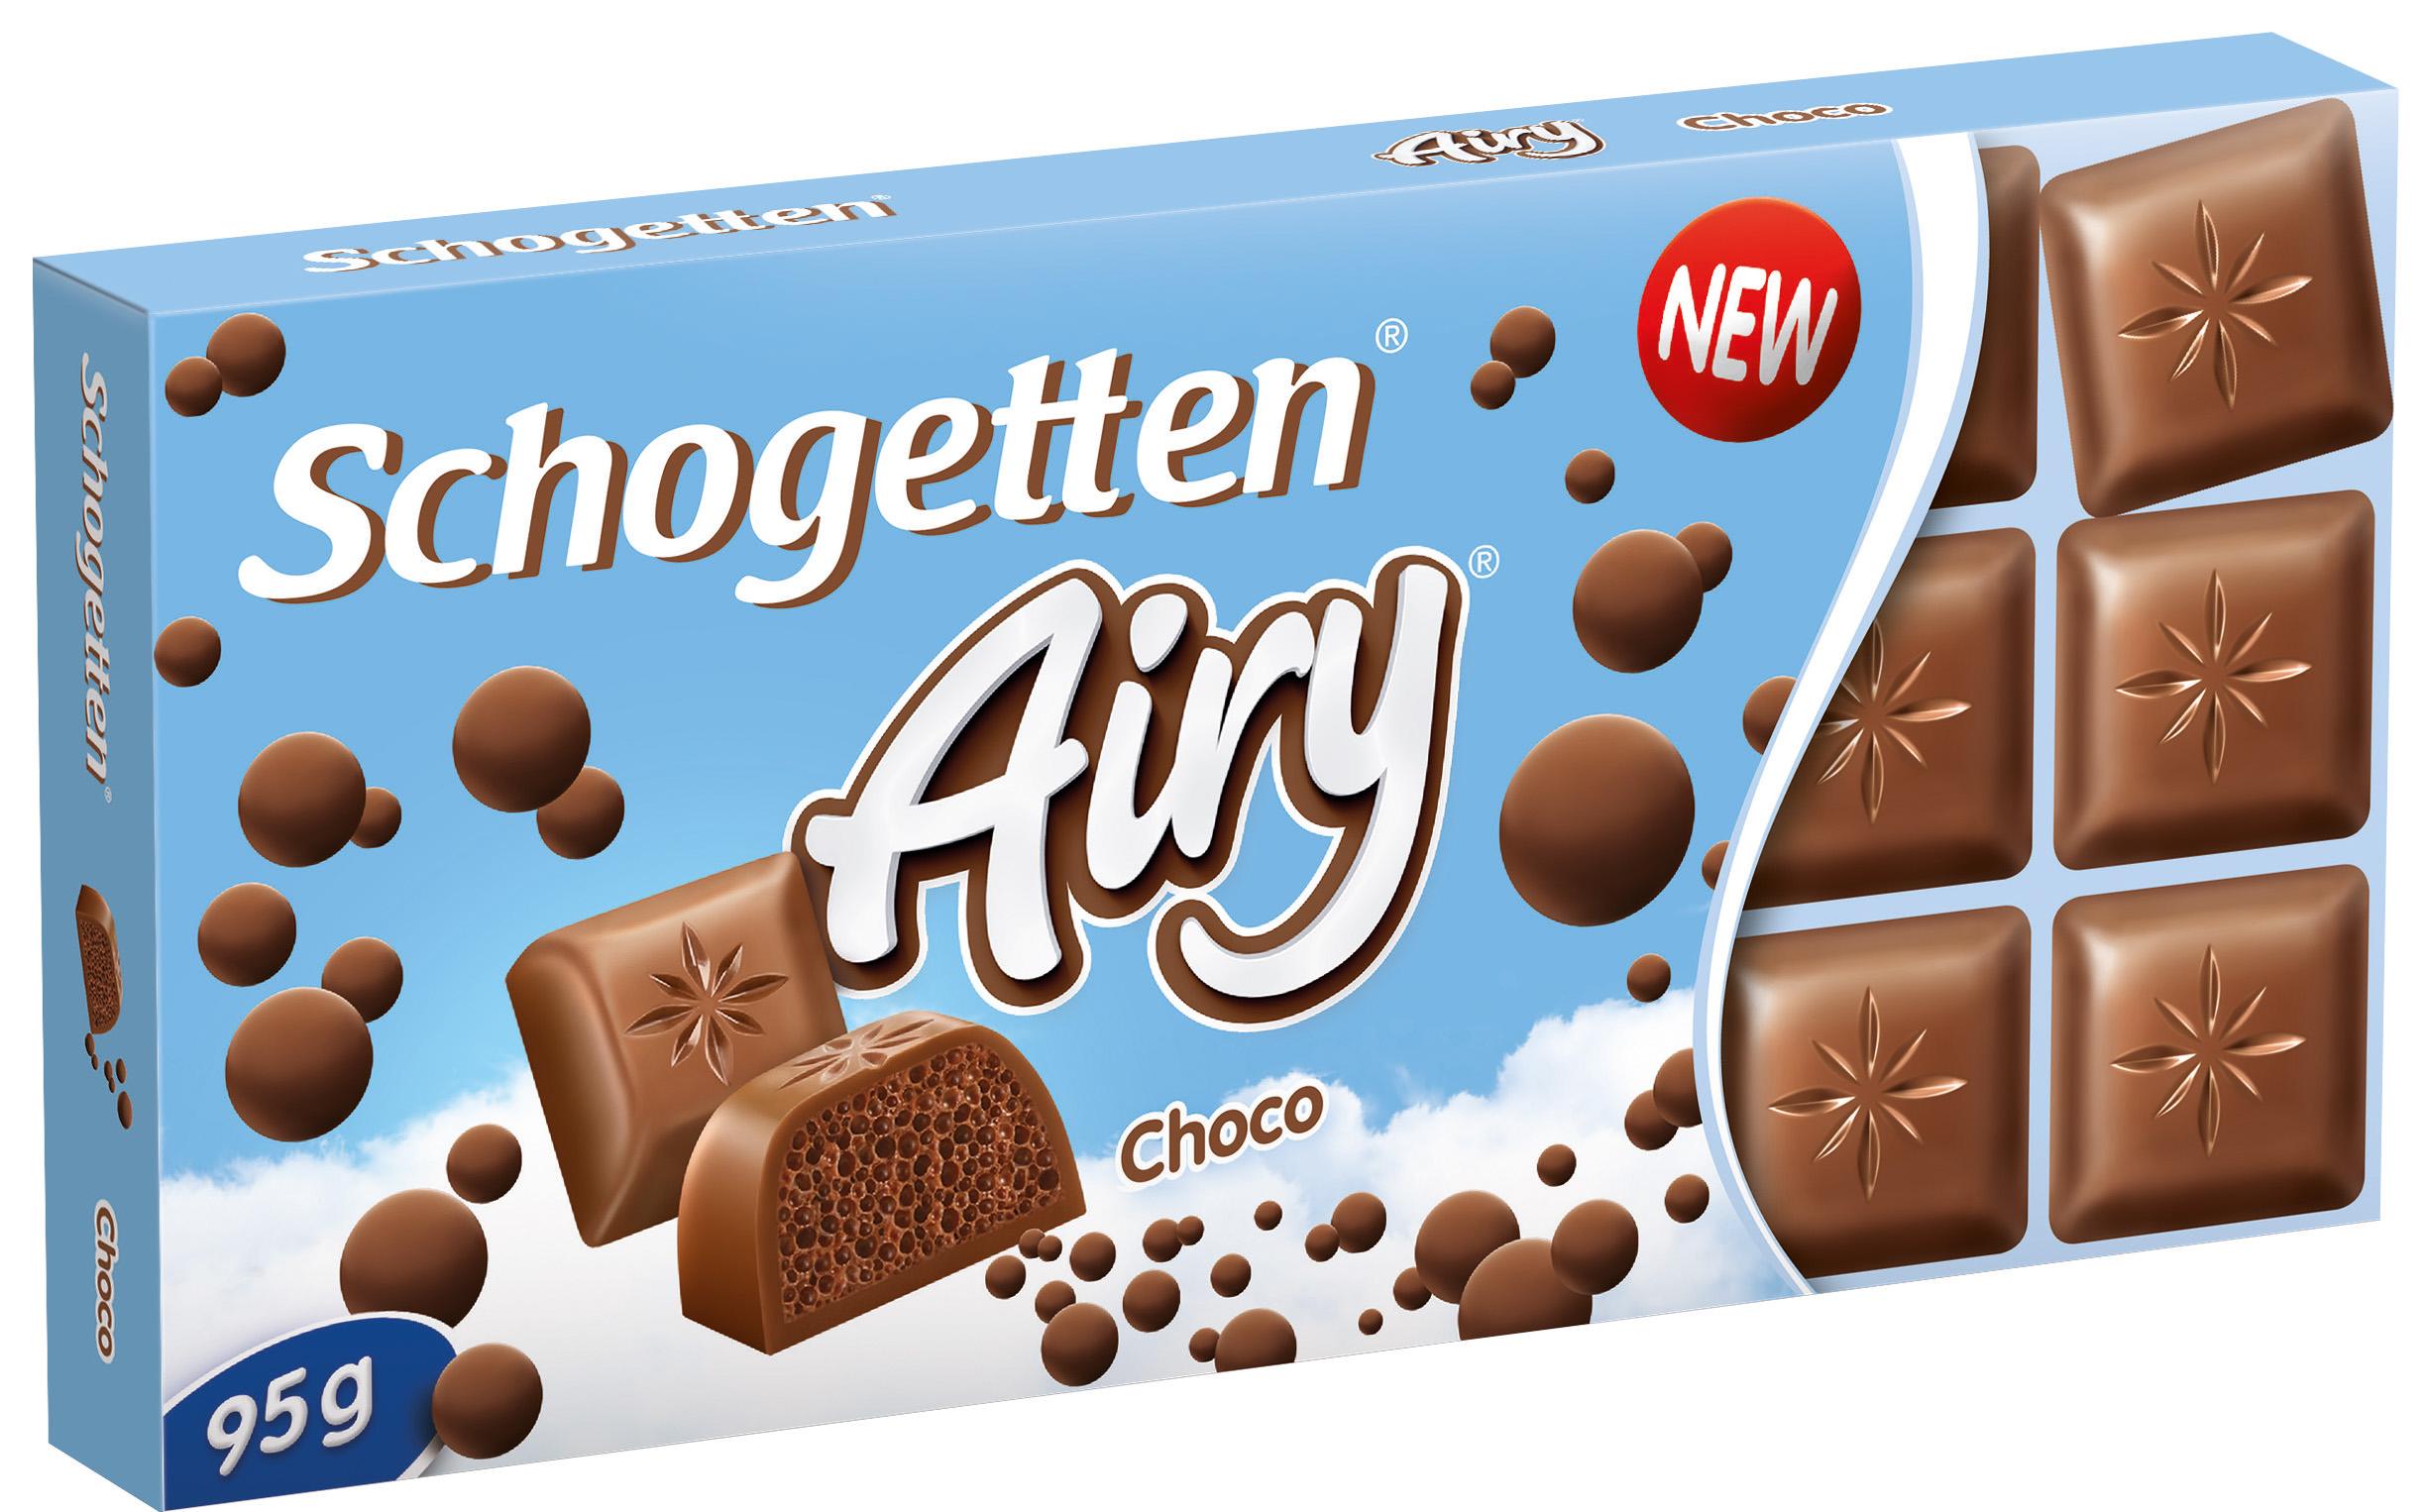 Schogetten mlečna vazdušasta 95g